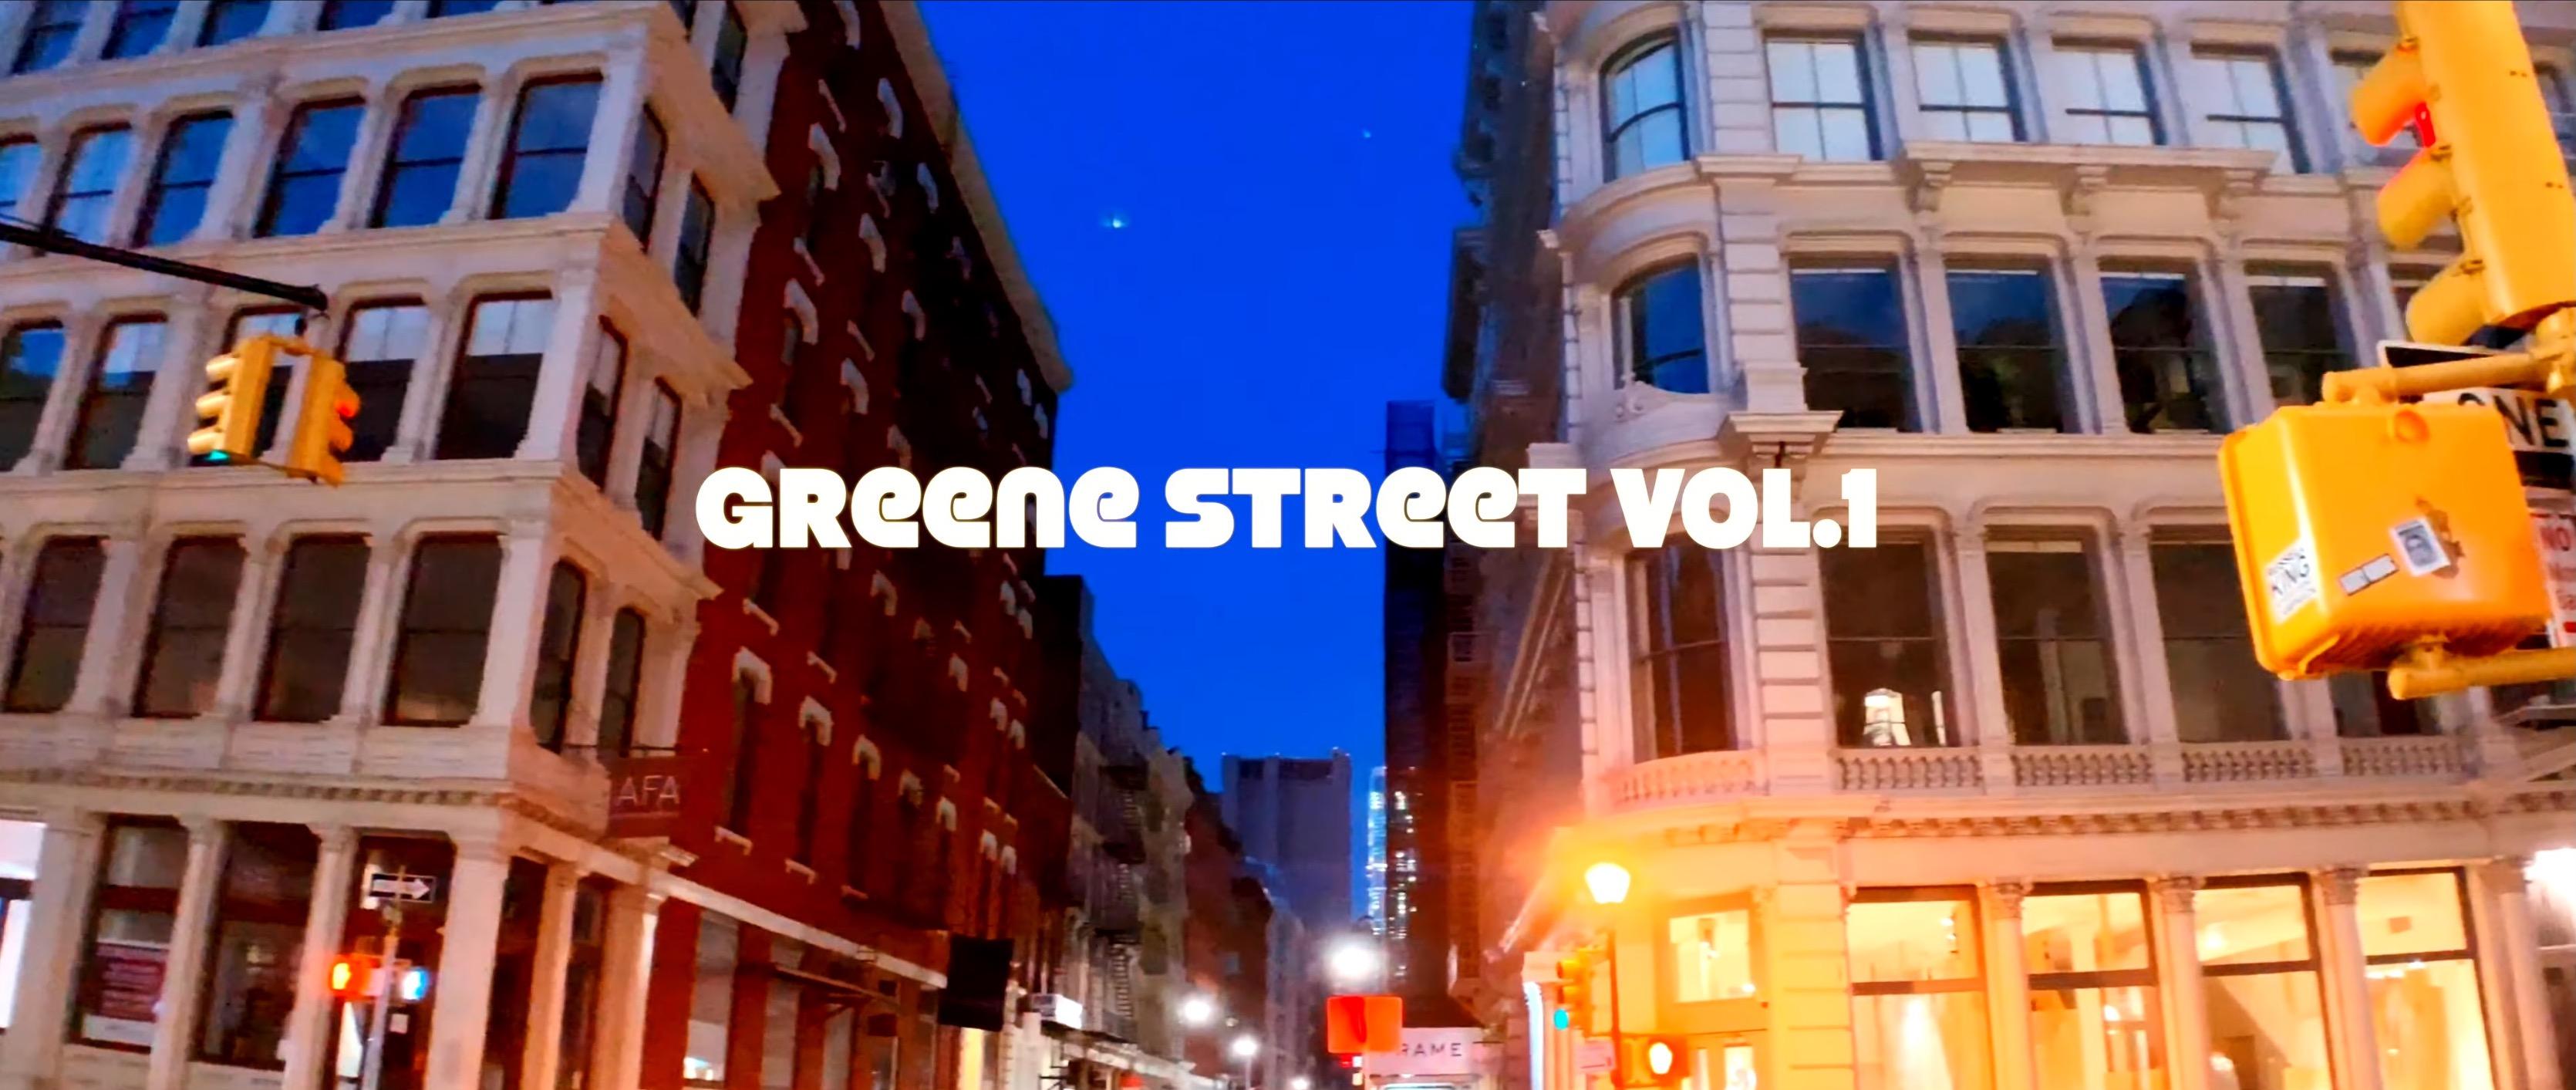 Will Sellenraad/Rene Hart/Eric McPherson – Greene Street Vol. 1 promo video